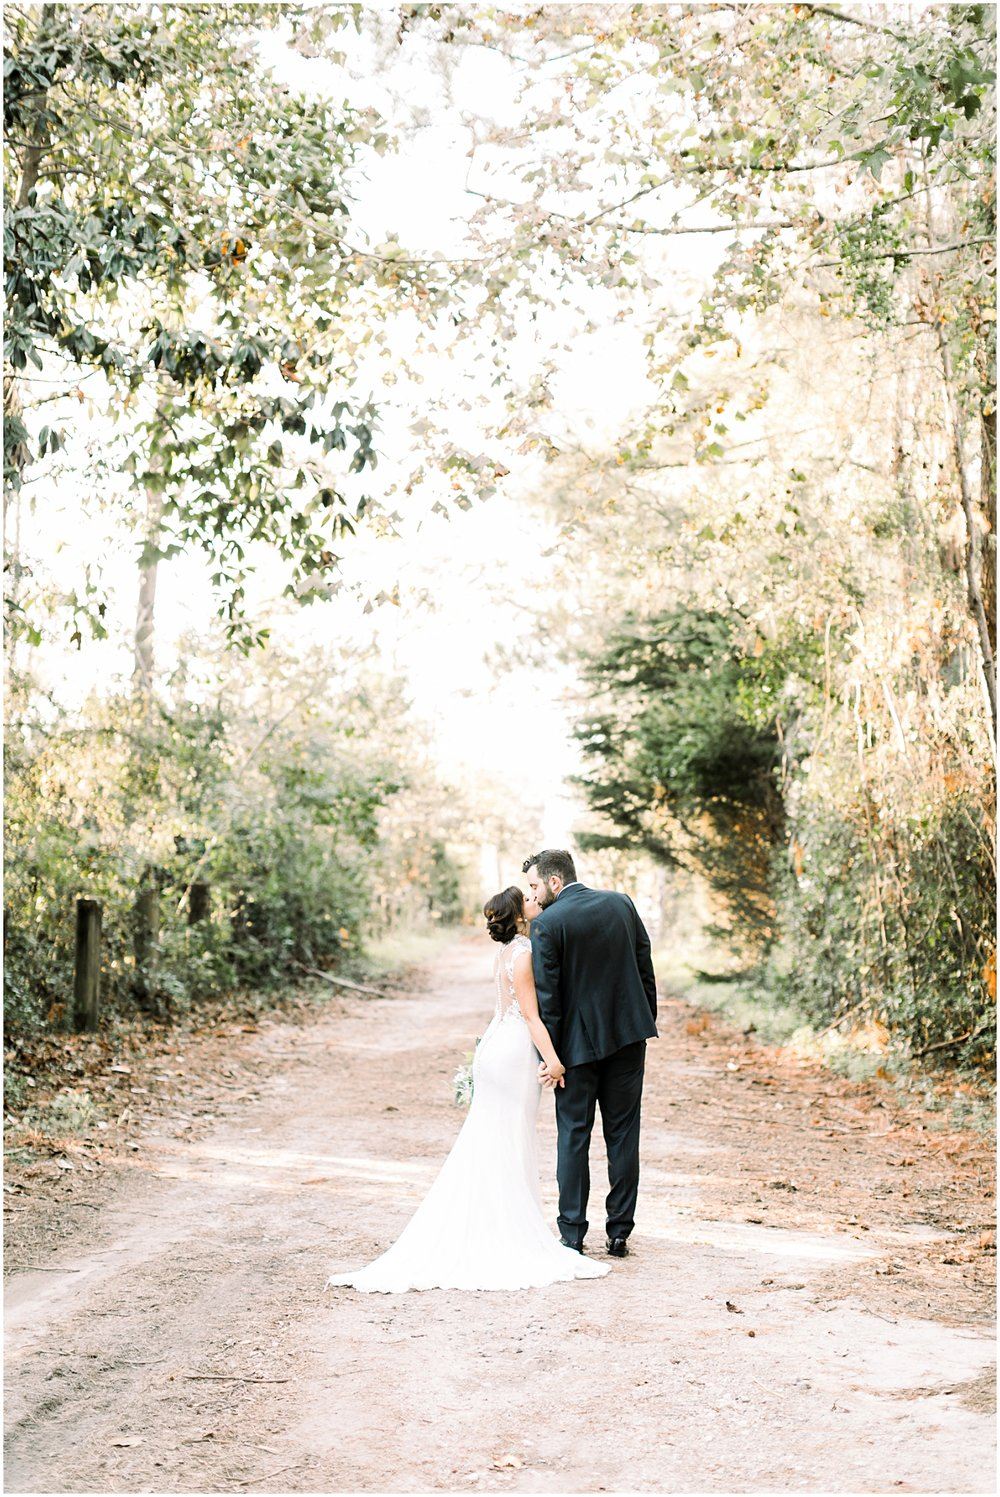 Wrightsville Manor Wedding Venue, Downtown Wilmington NC Wedding_Erin L. Taylor Photography_0029.jpg